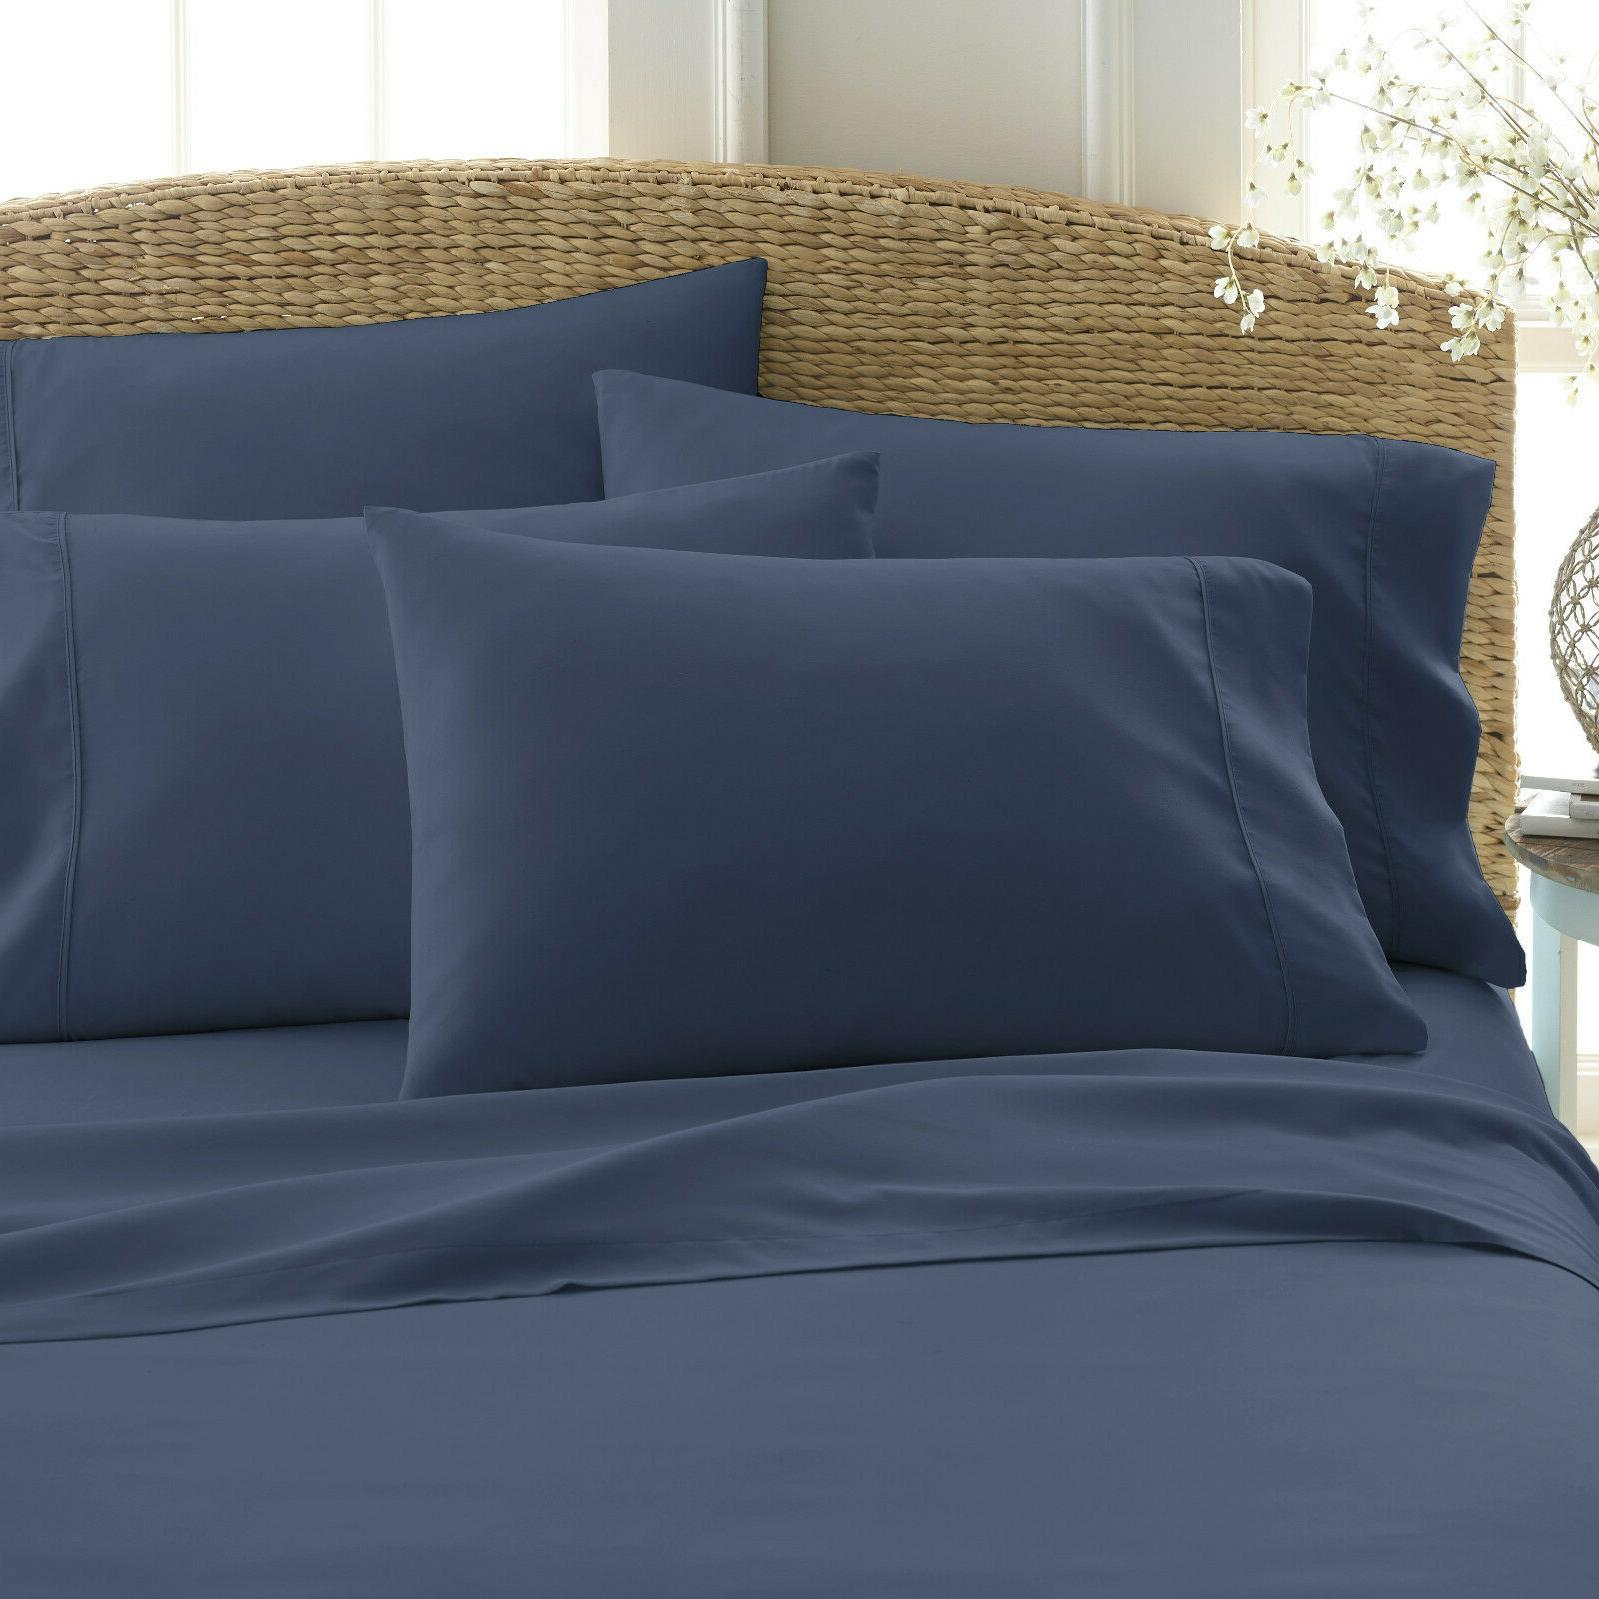 KING DEEP PIECE EXTRA SOFT BED SHEET